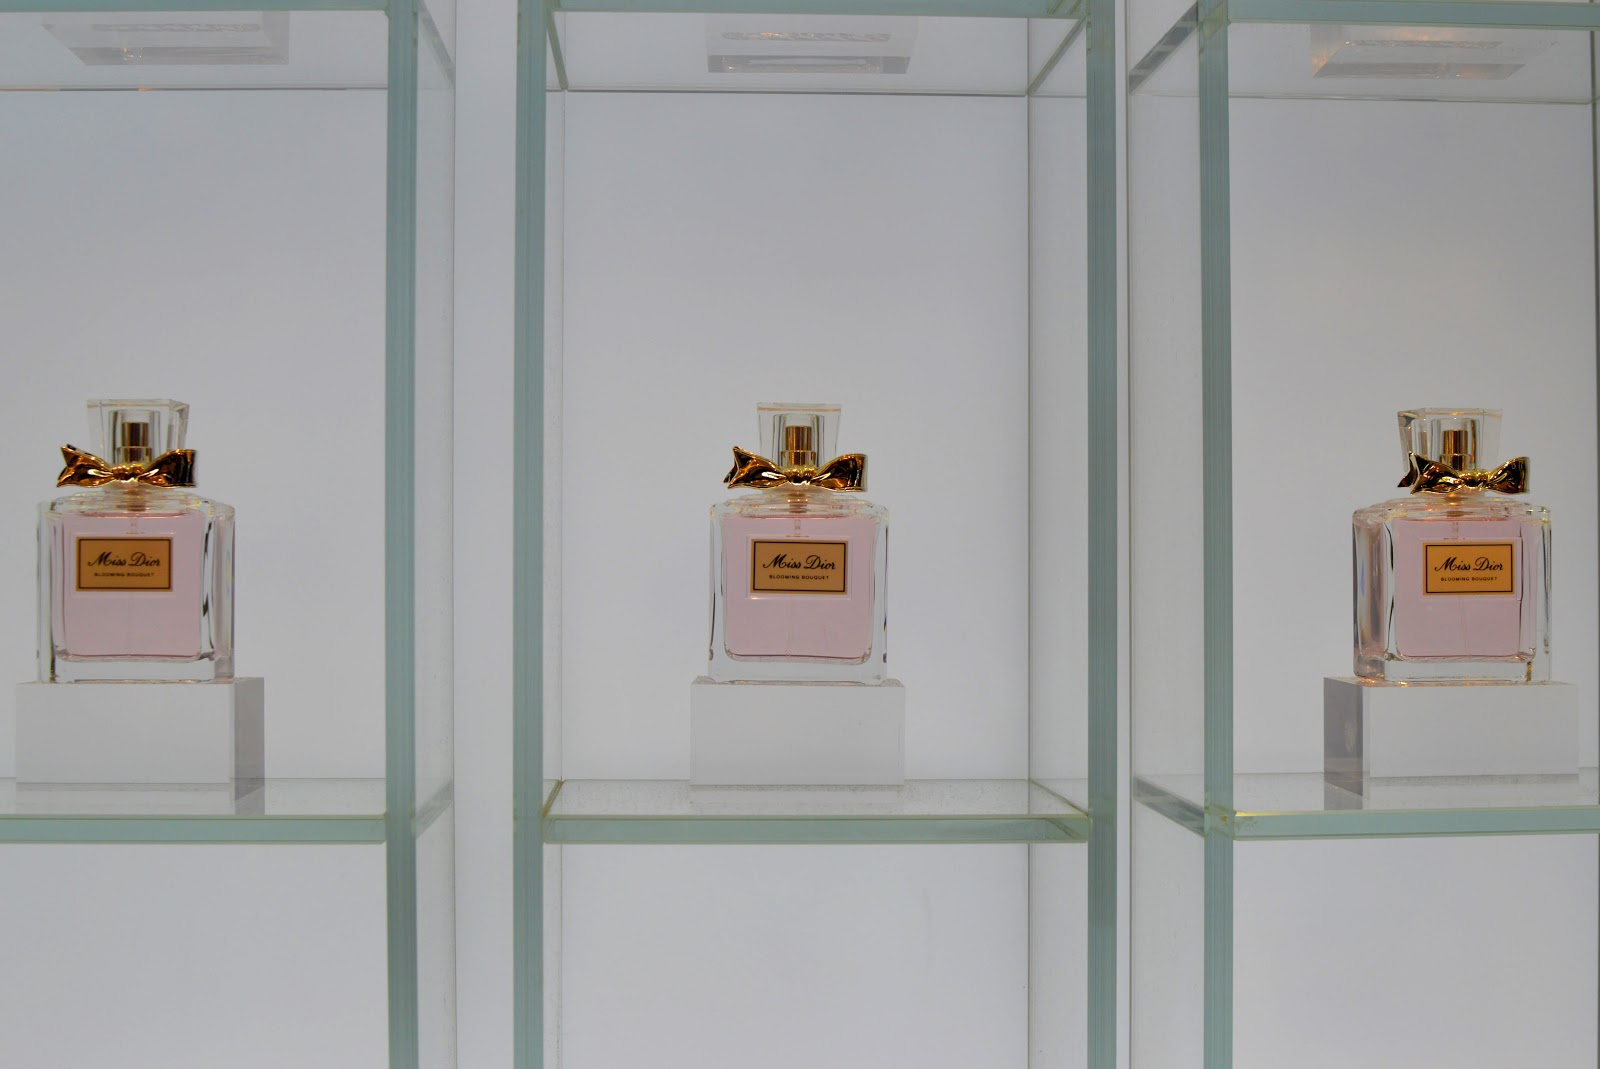 , Dior Forever